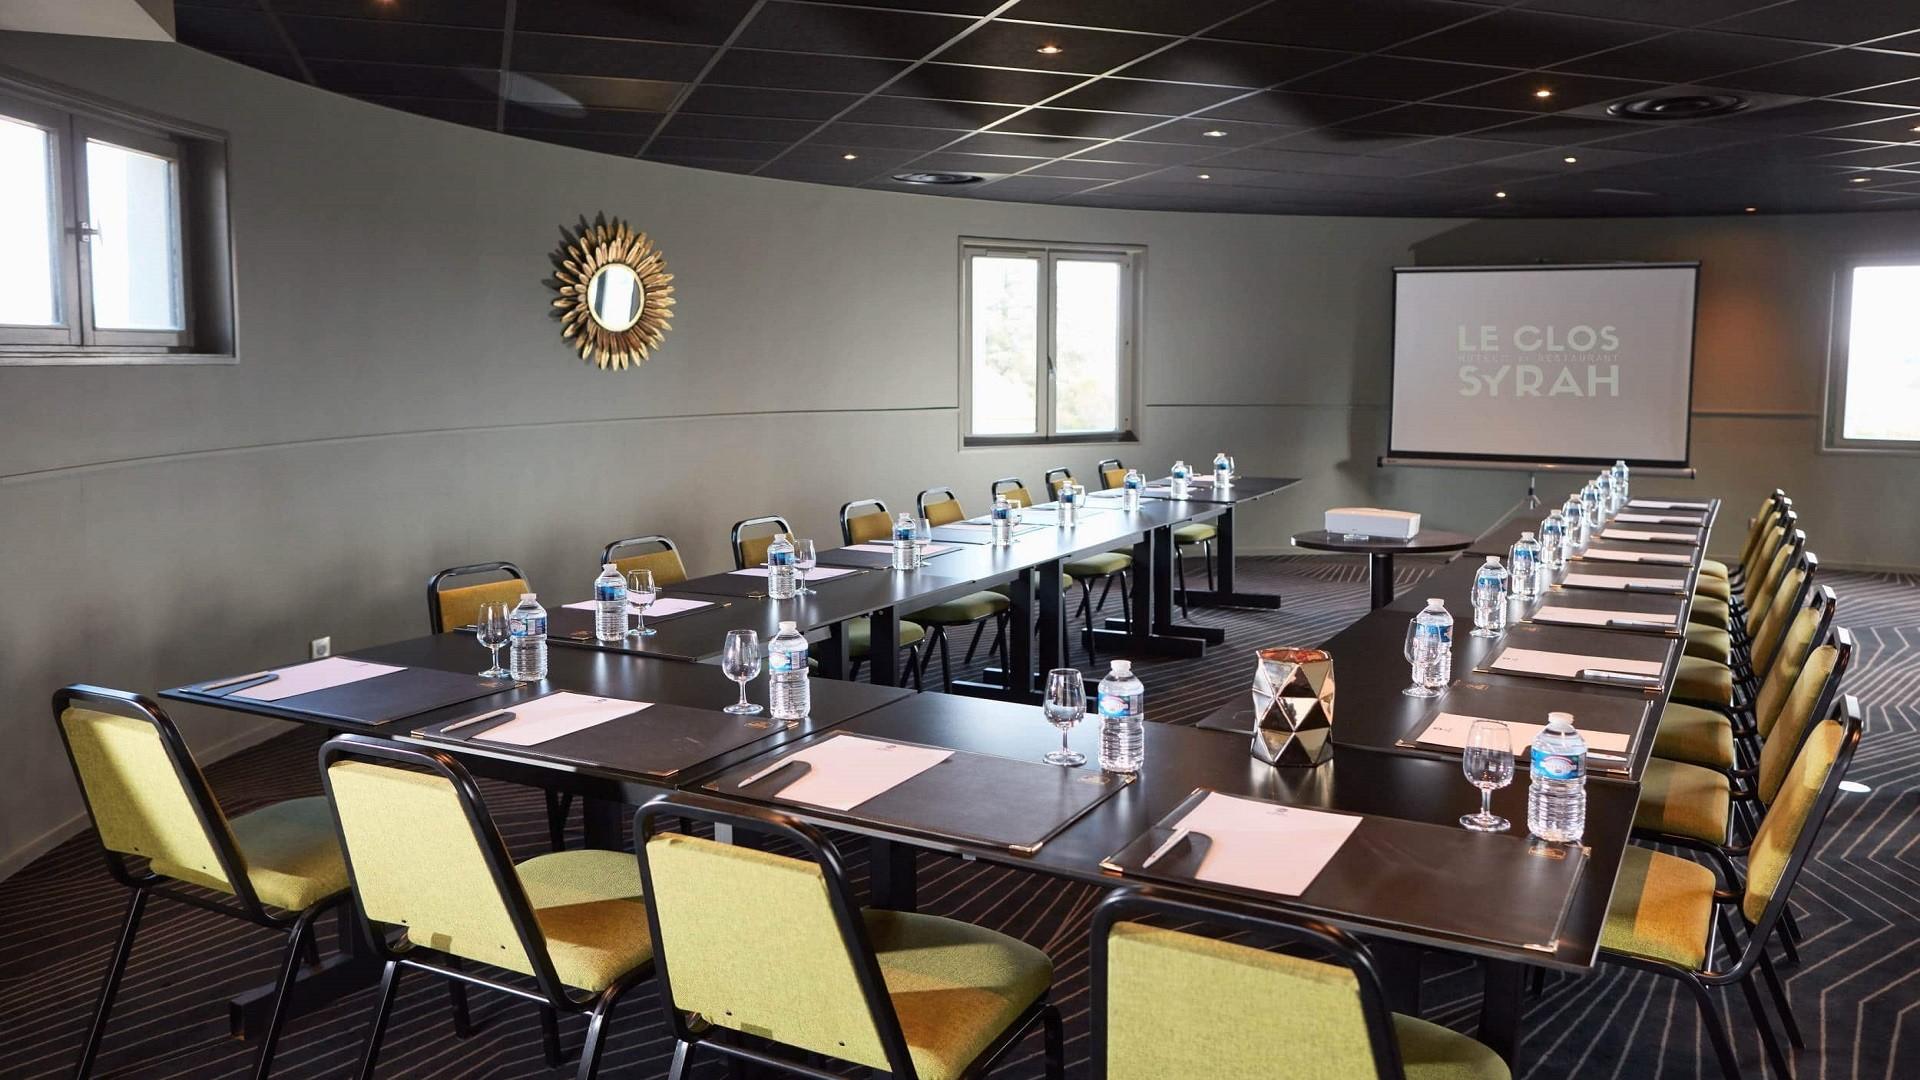 Clos-Syrah-Valence-seminaires-de-caractere-Salon-Hermitage